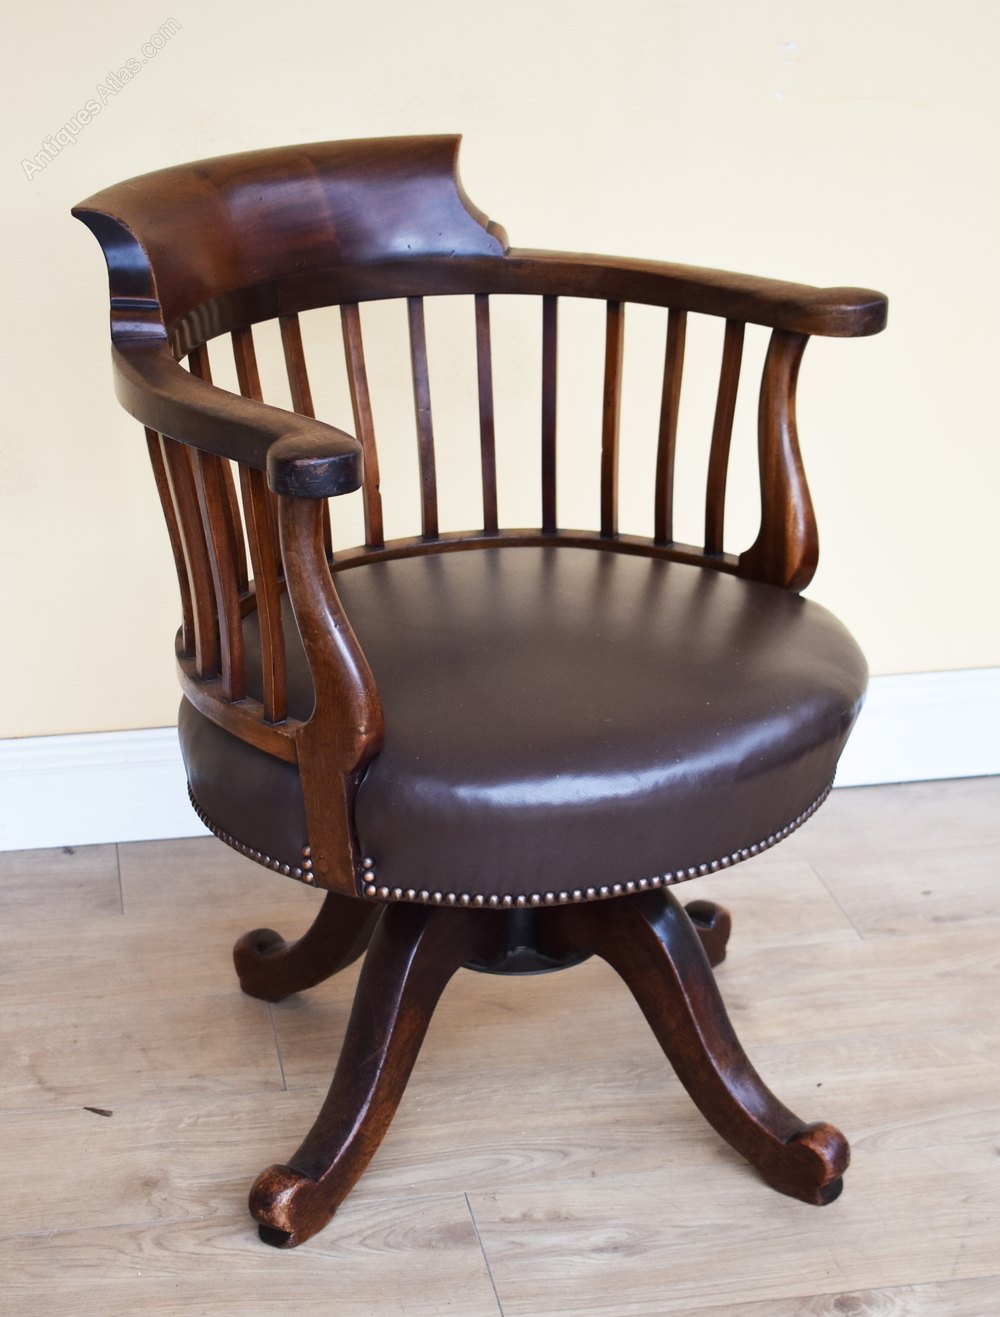 19th Century Victorian Mahogany Swivel Chair Antiques Atlas Chair Antique Desk Chair Swivel Chair Desk